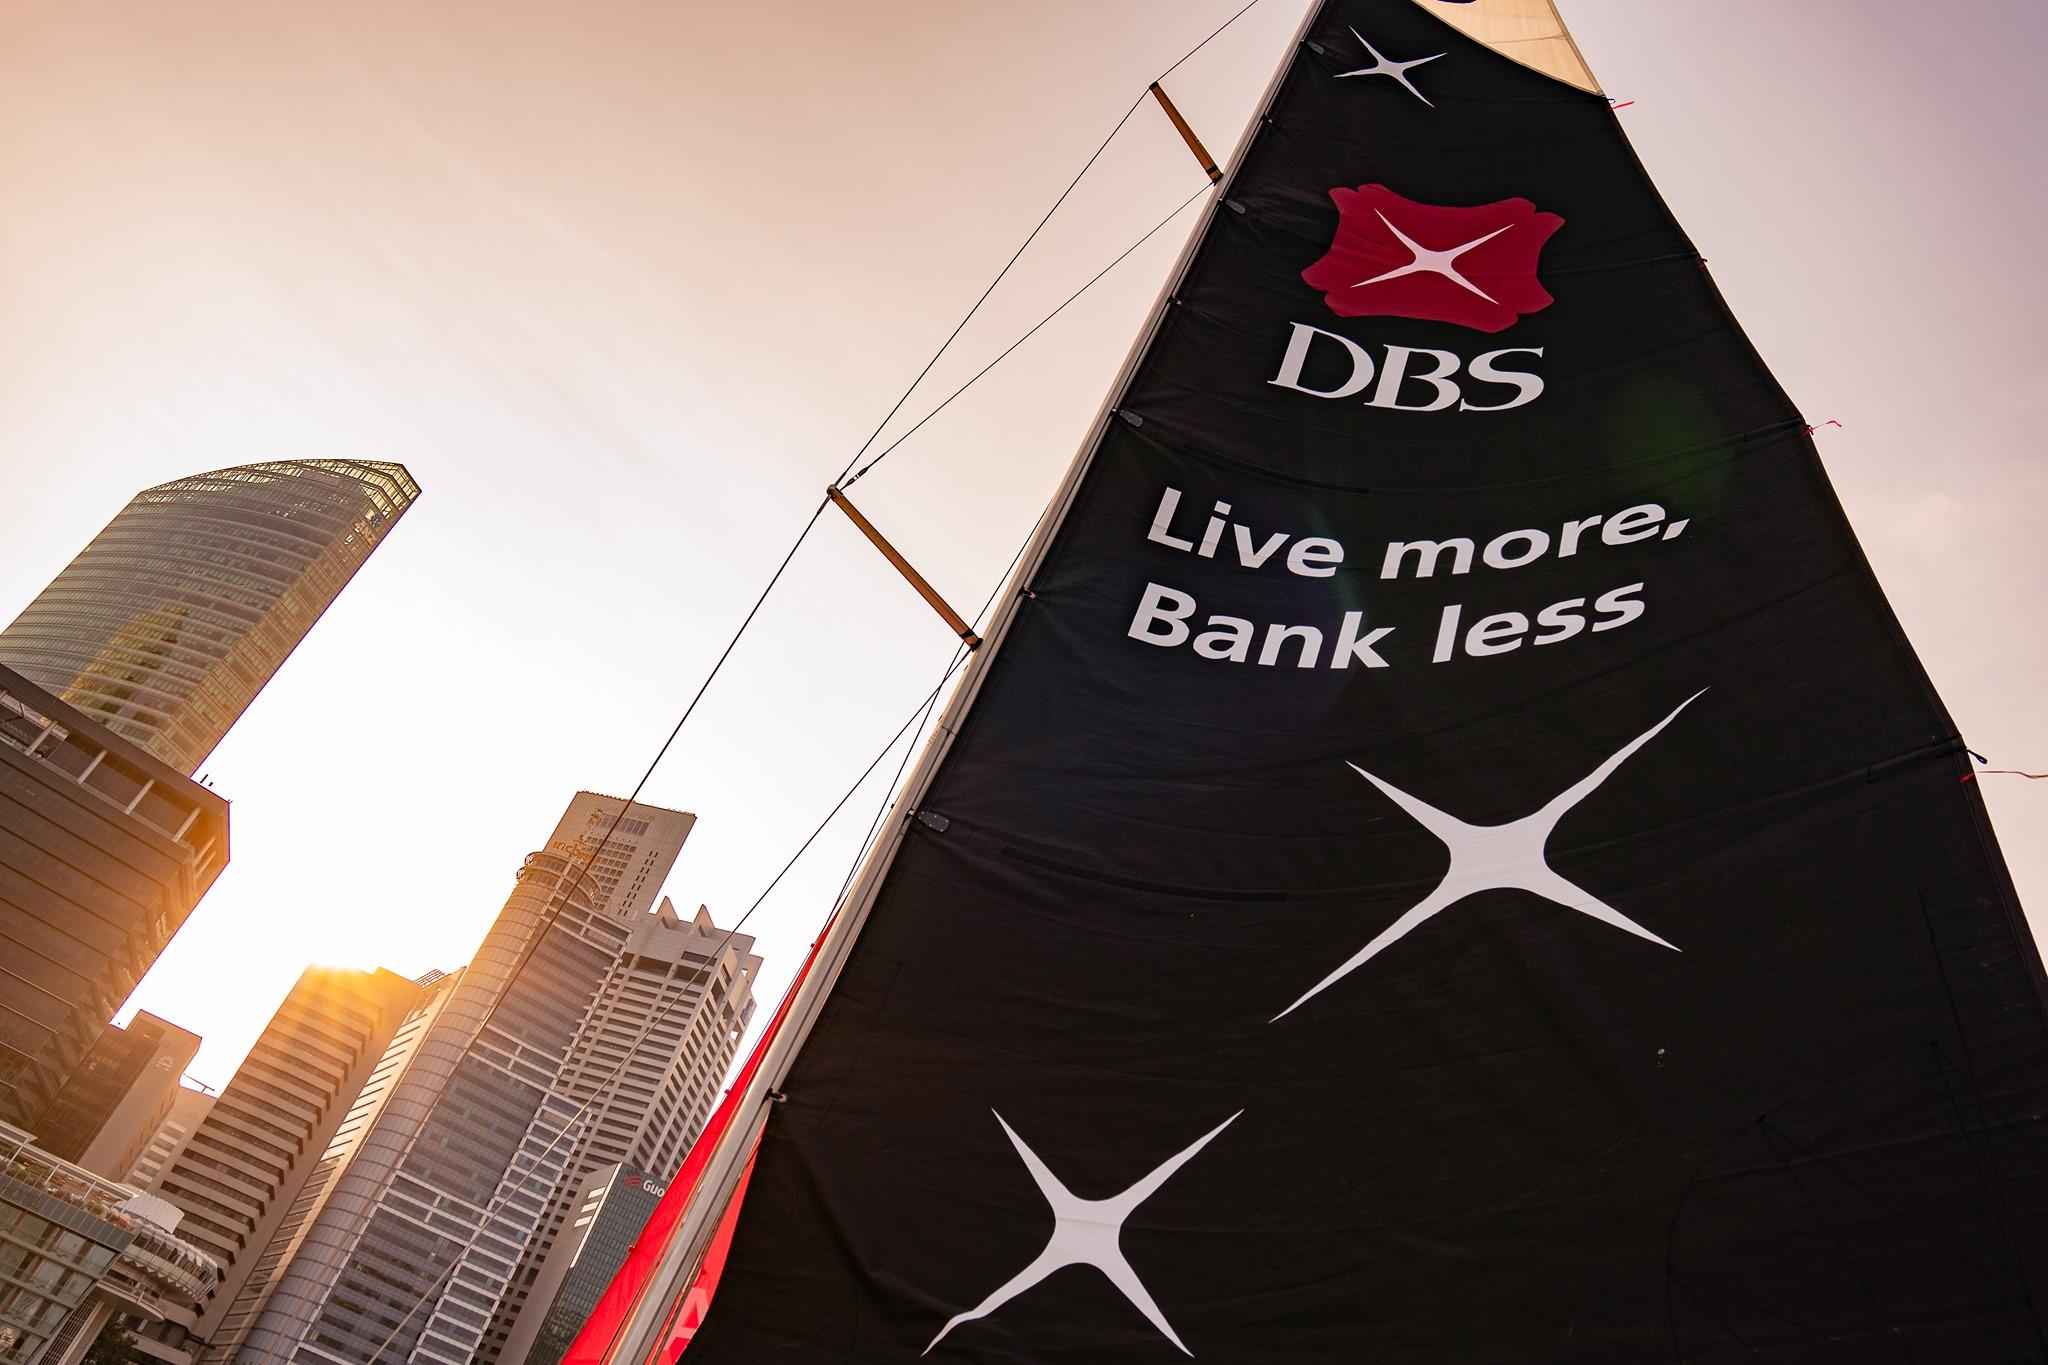 Photo courtesy: DBS